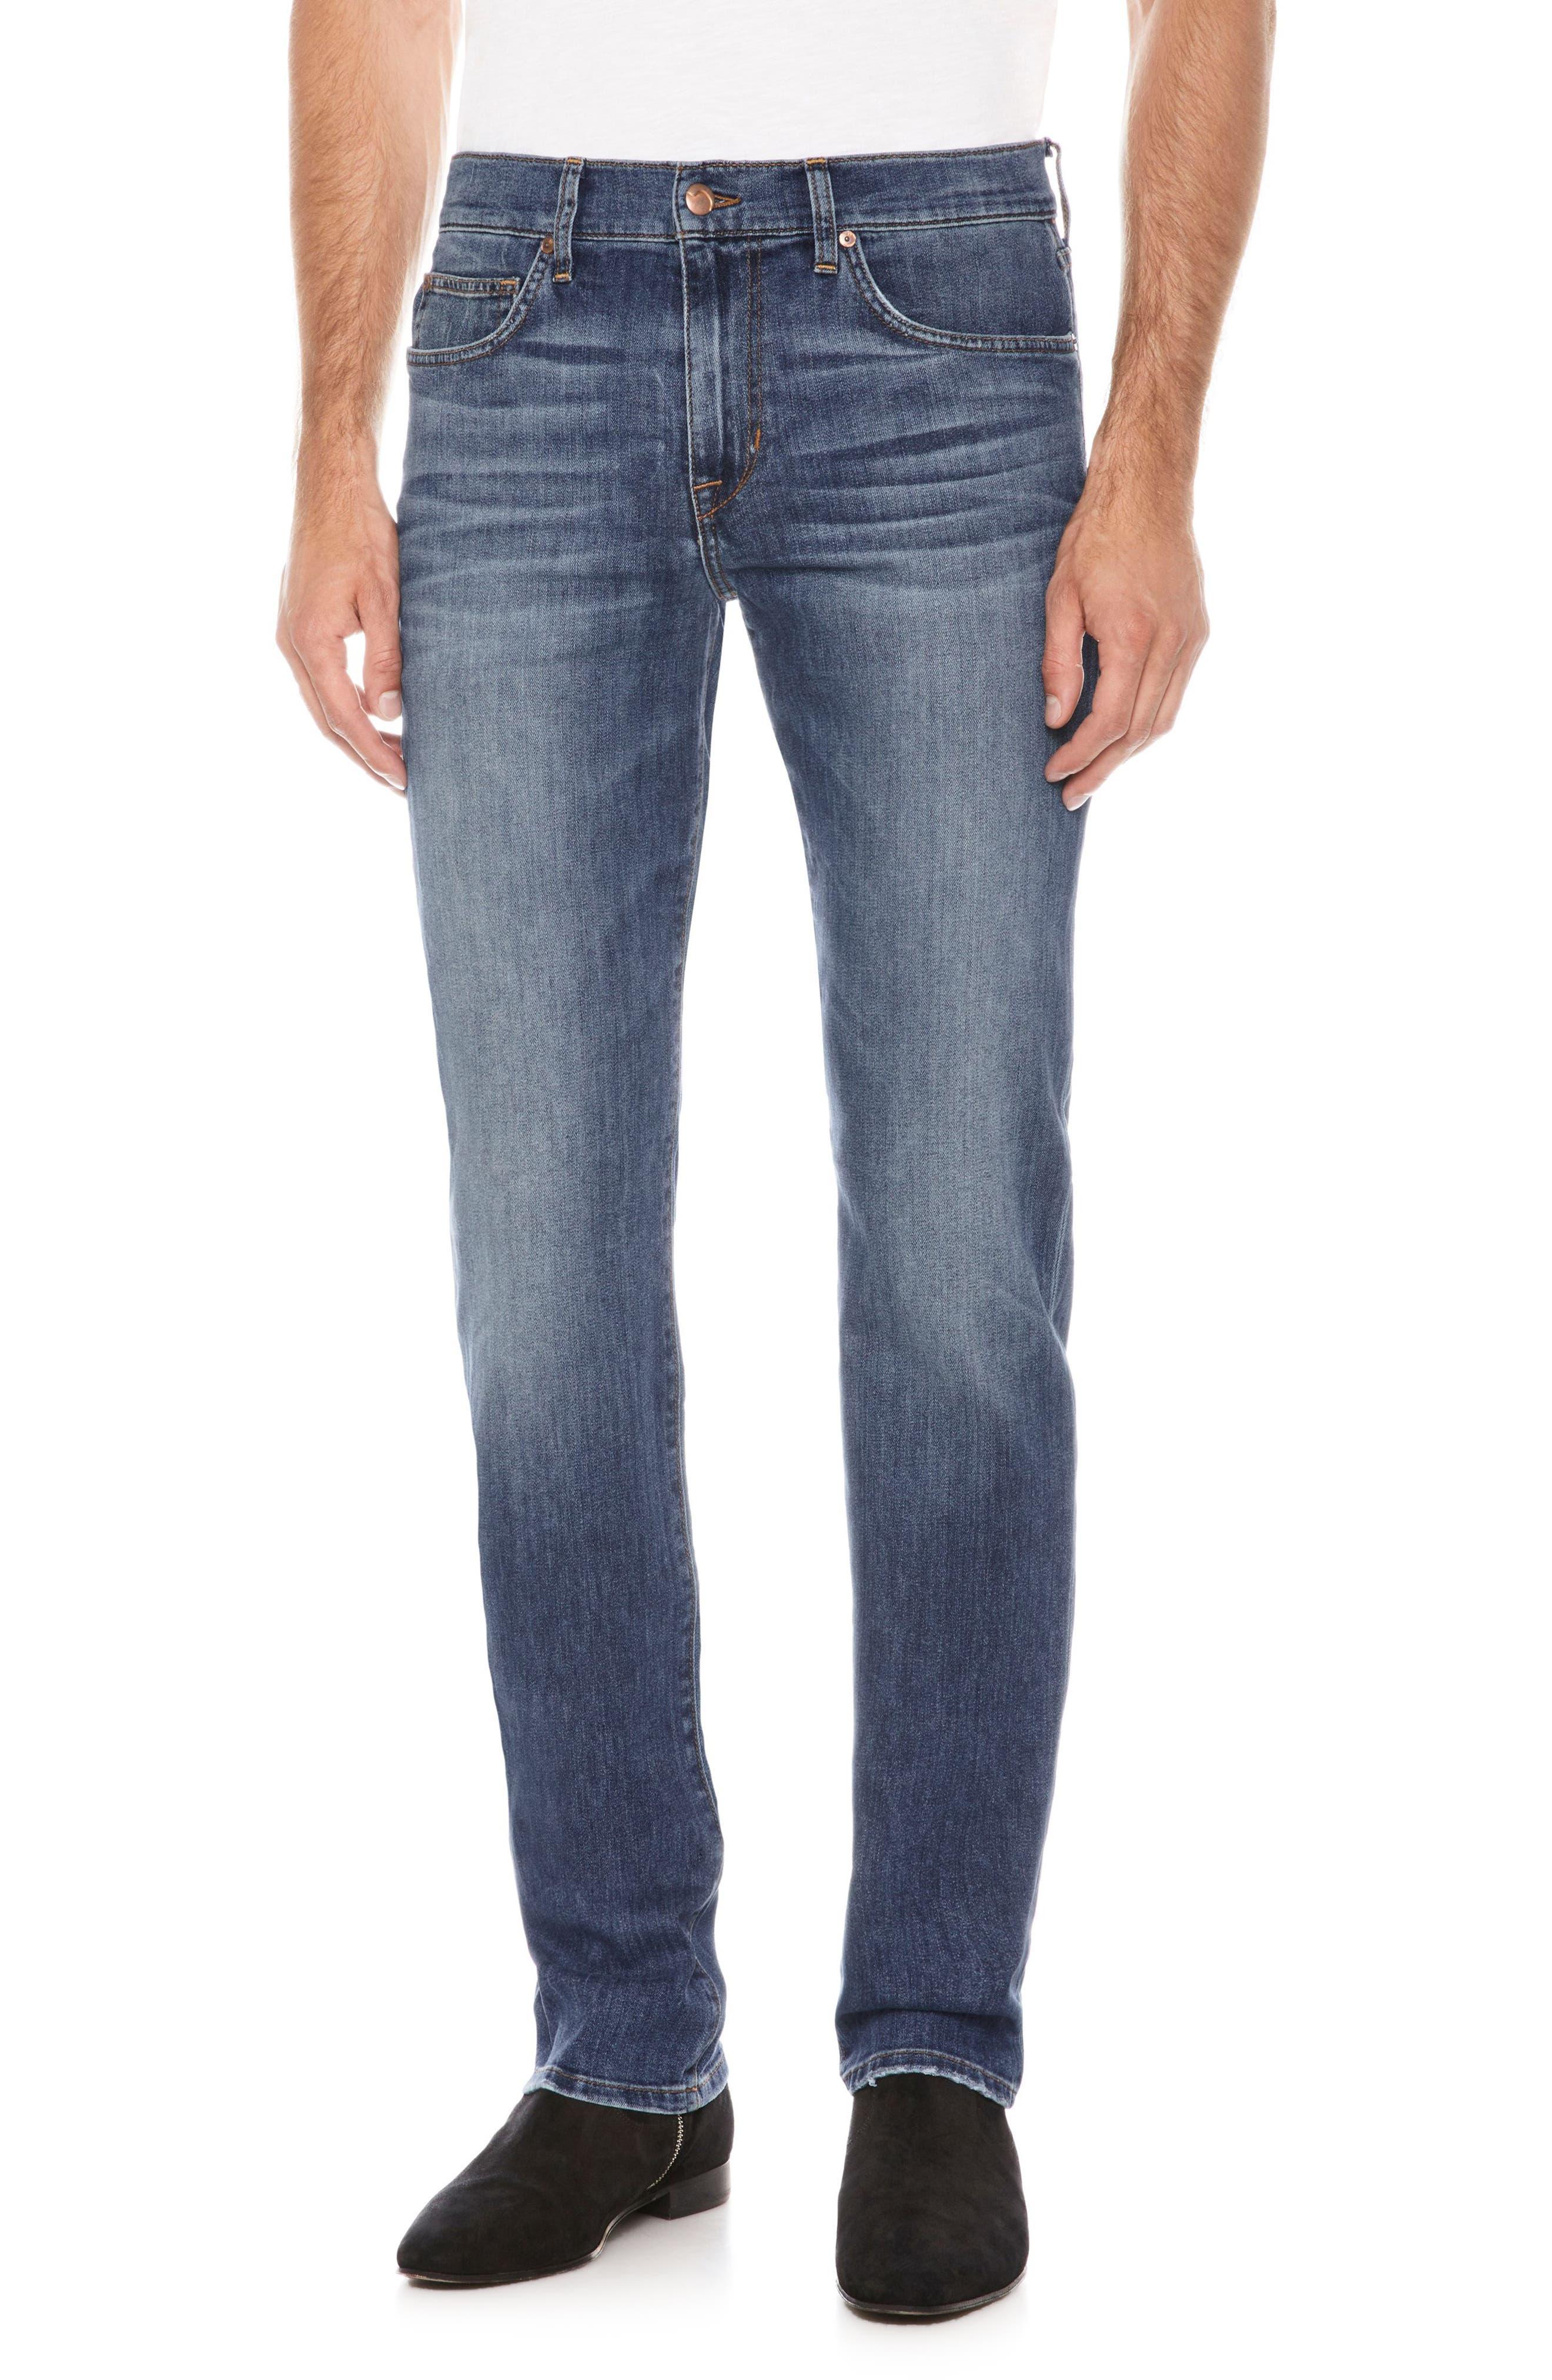 Folsom Slim Fit Jeans,                             Main thumbnail 1, color,                             Freeman